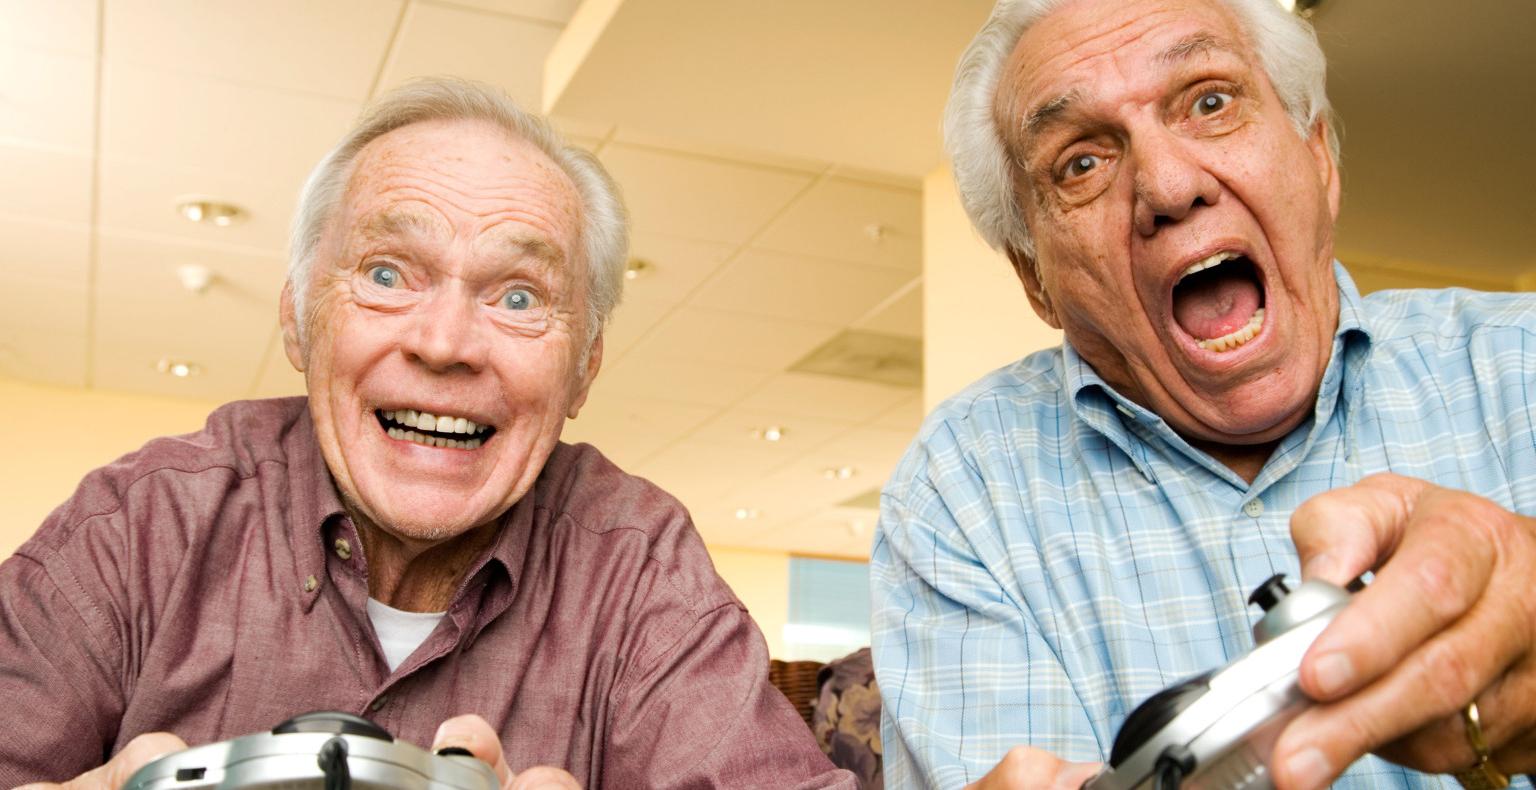 old men playing video games